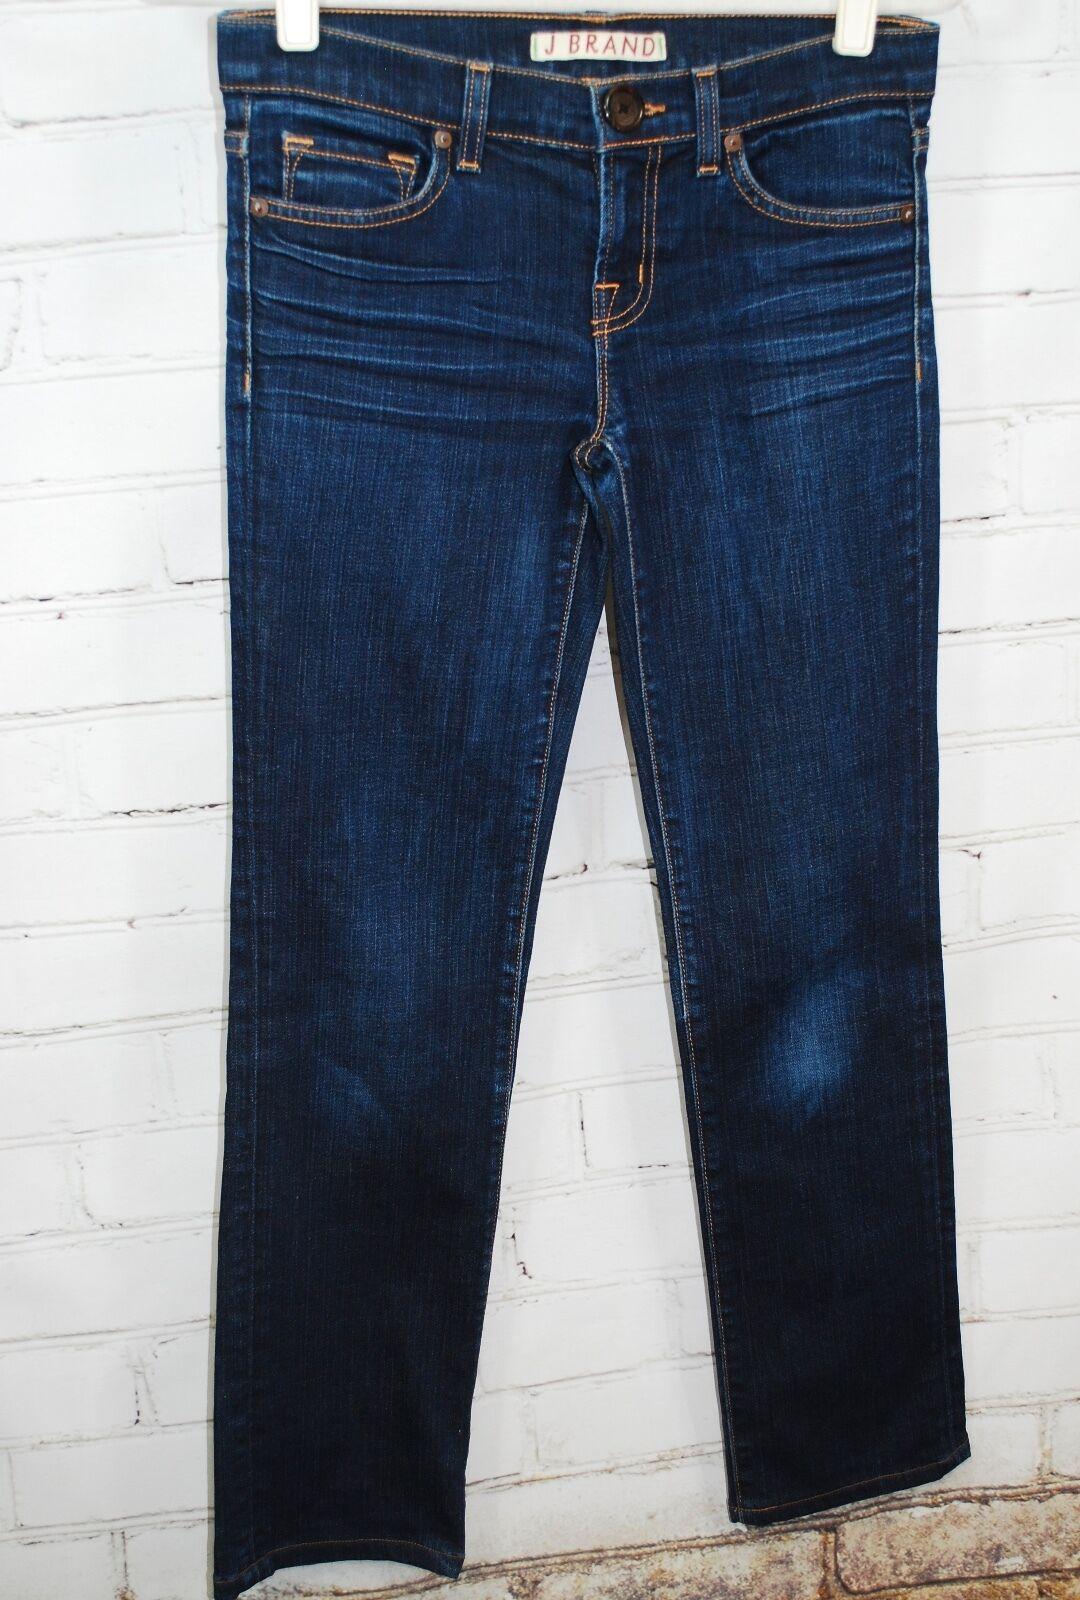 J BRAND bluee Dark Wash INK The Cigarette Leg Straight Jeans Size 25